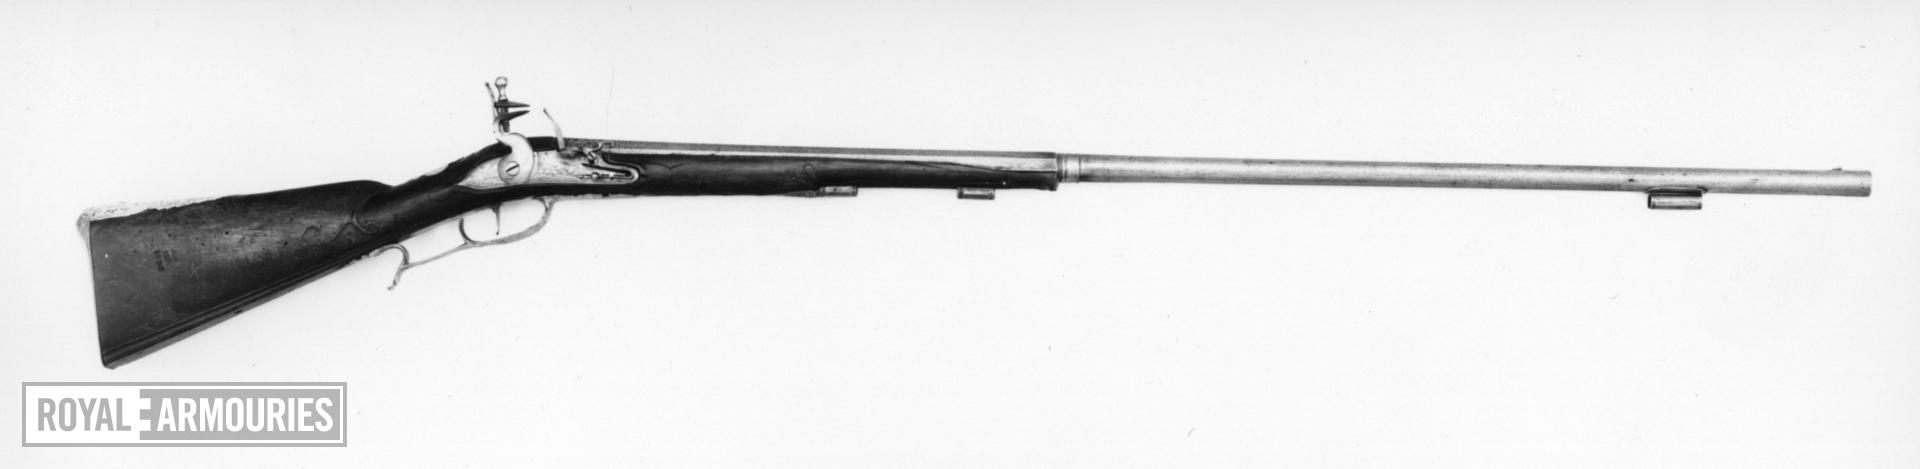 Flintlock muzzle-loading rifle